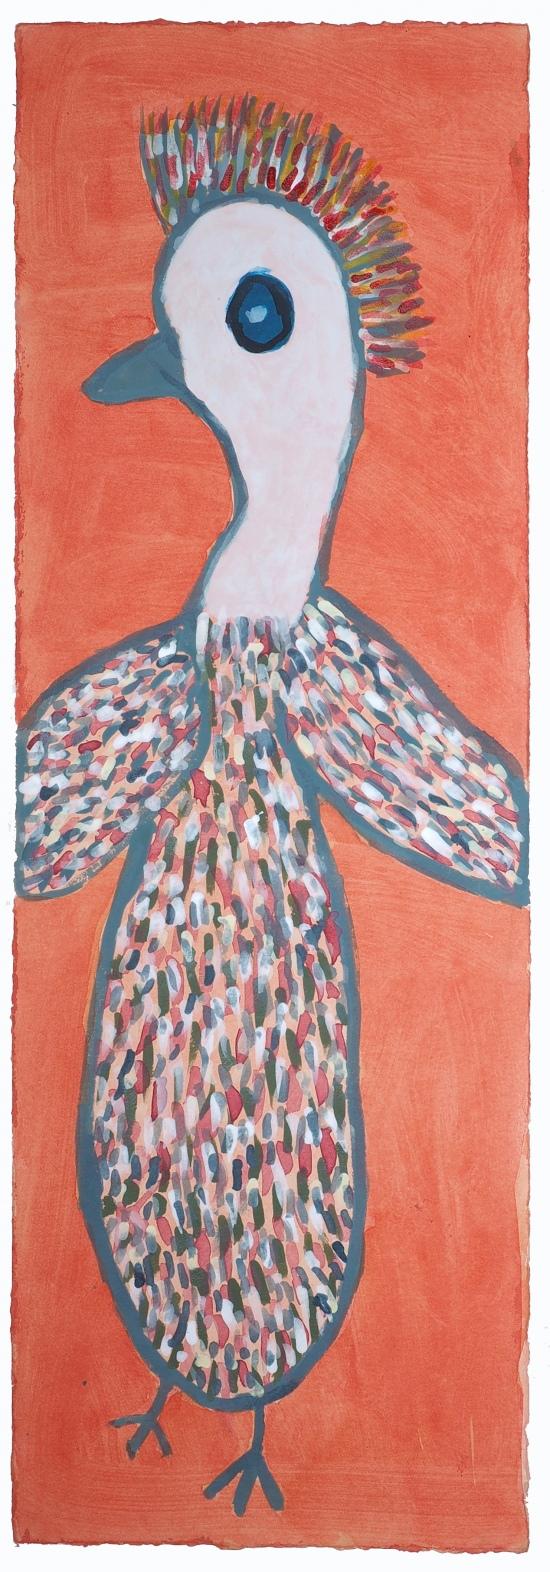 Trudy Inkamala, Bird, 2021